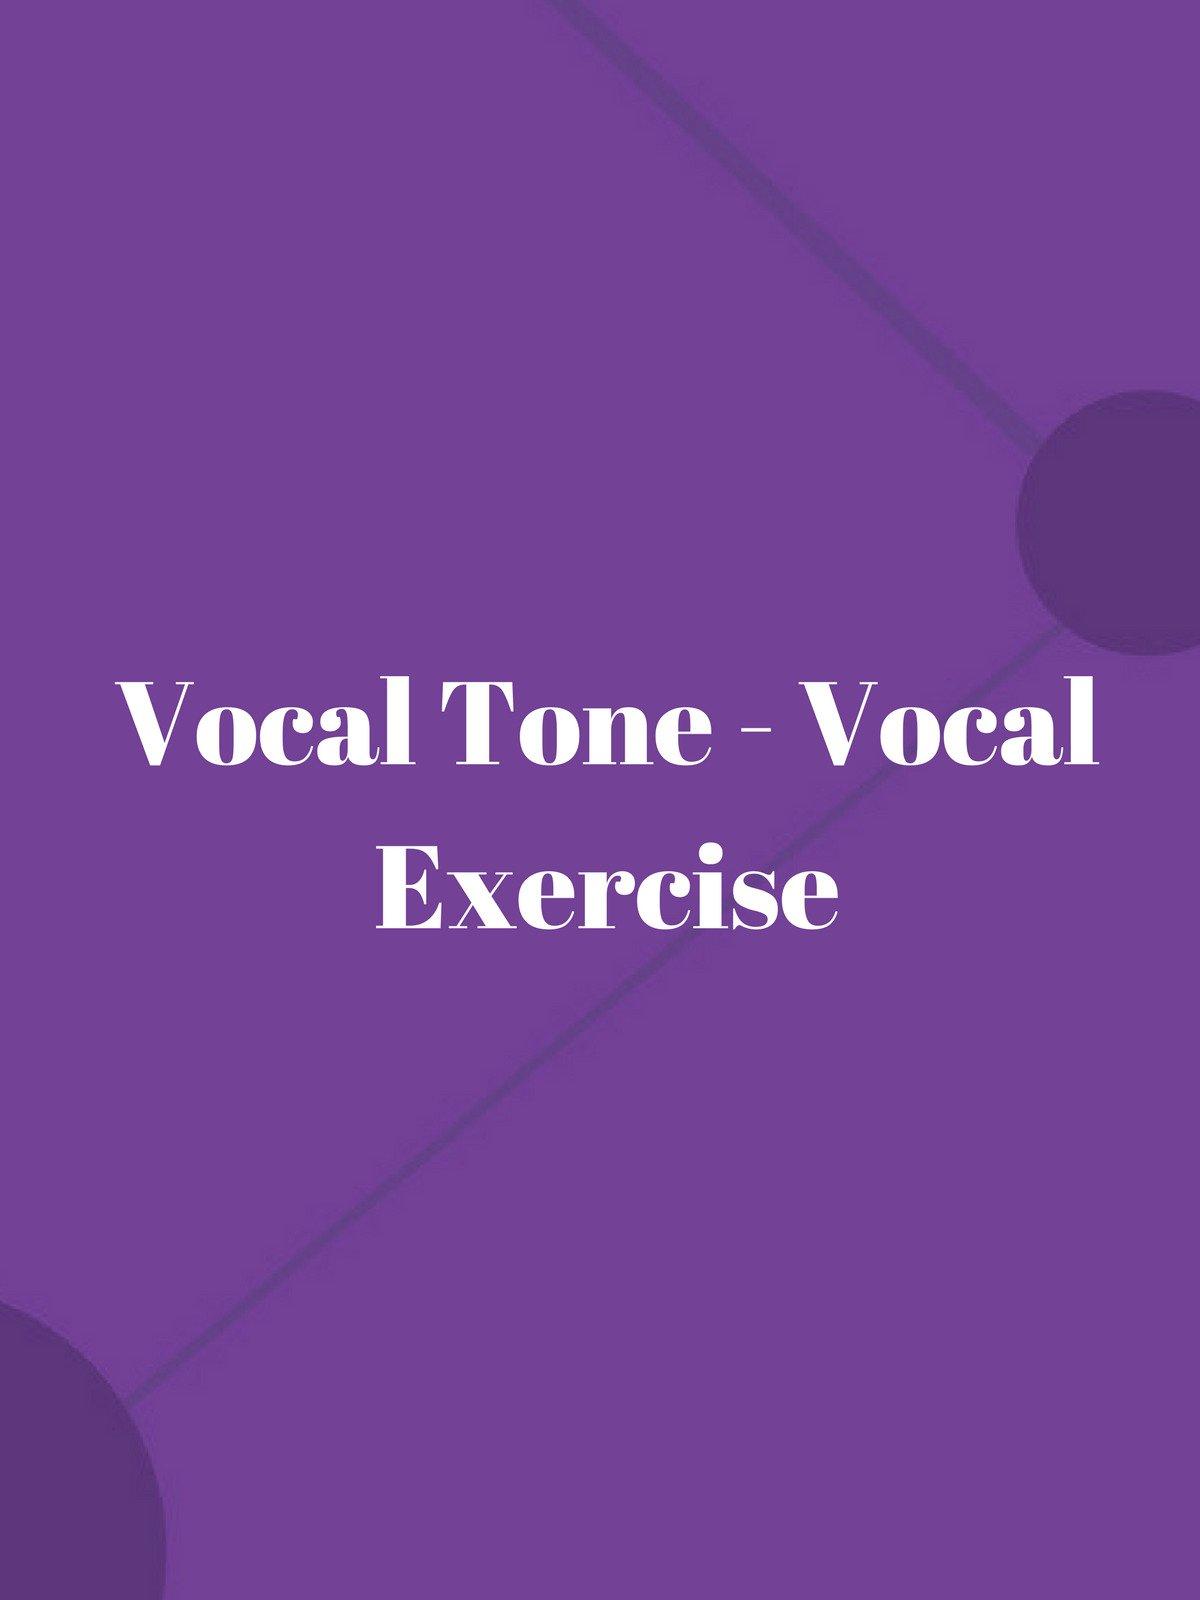 Vocal Tone